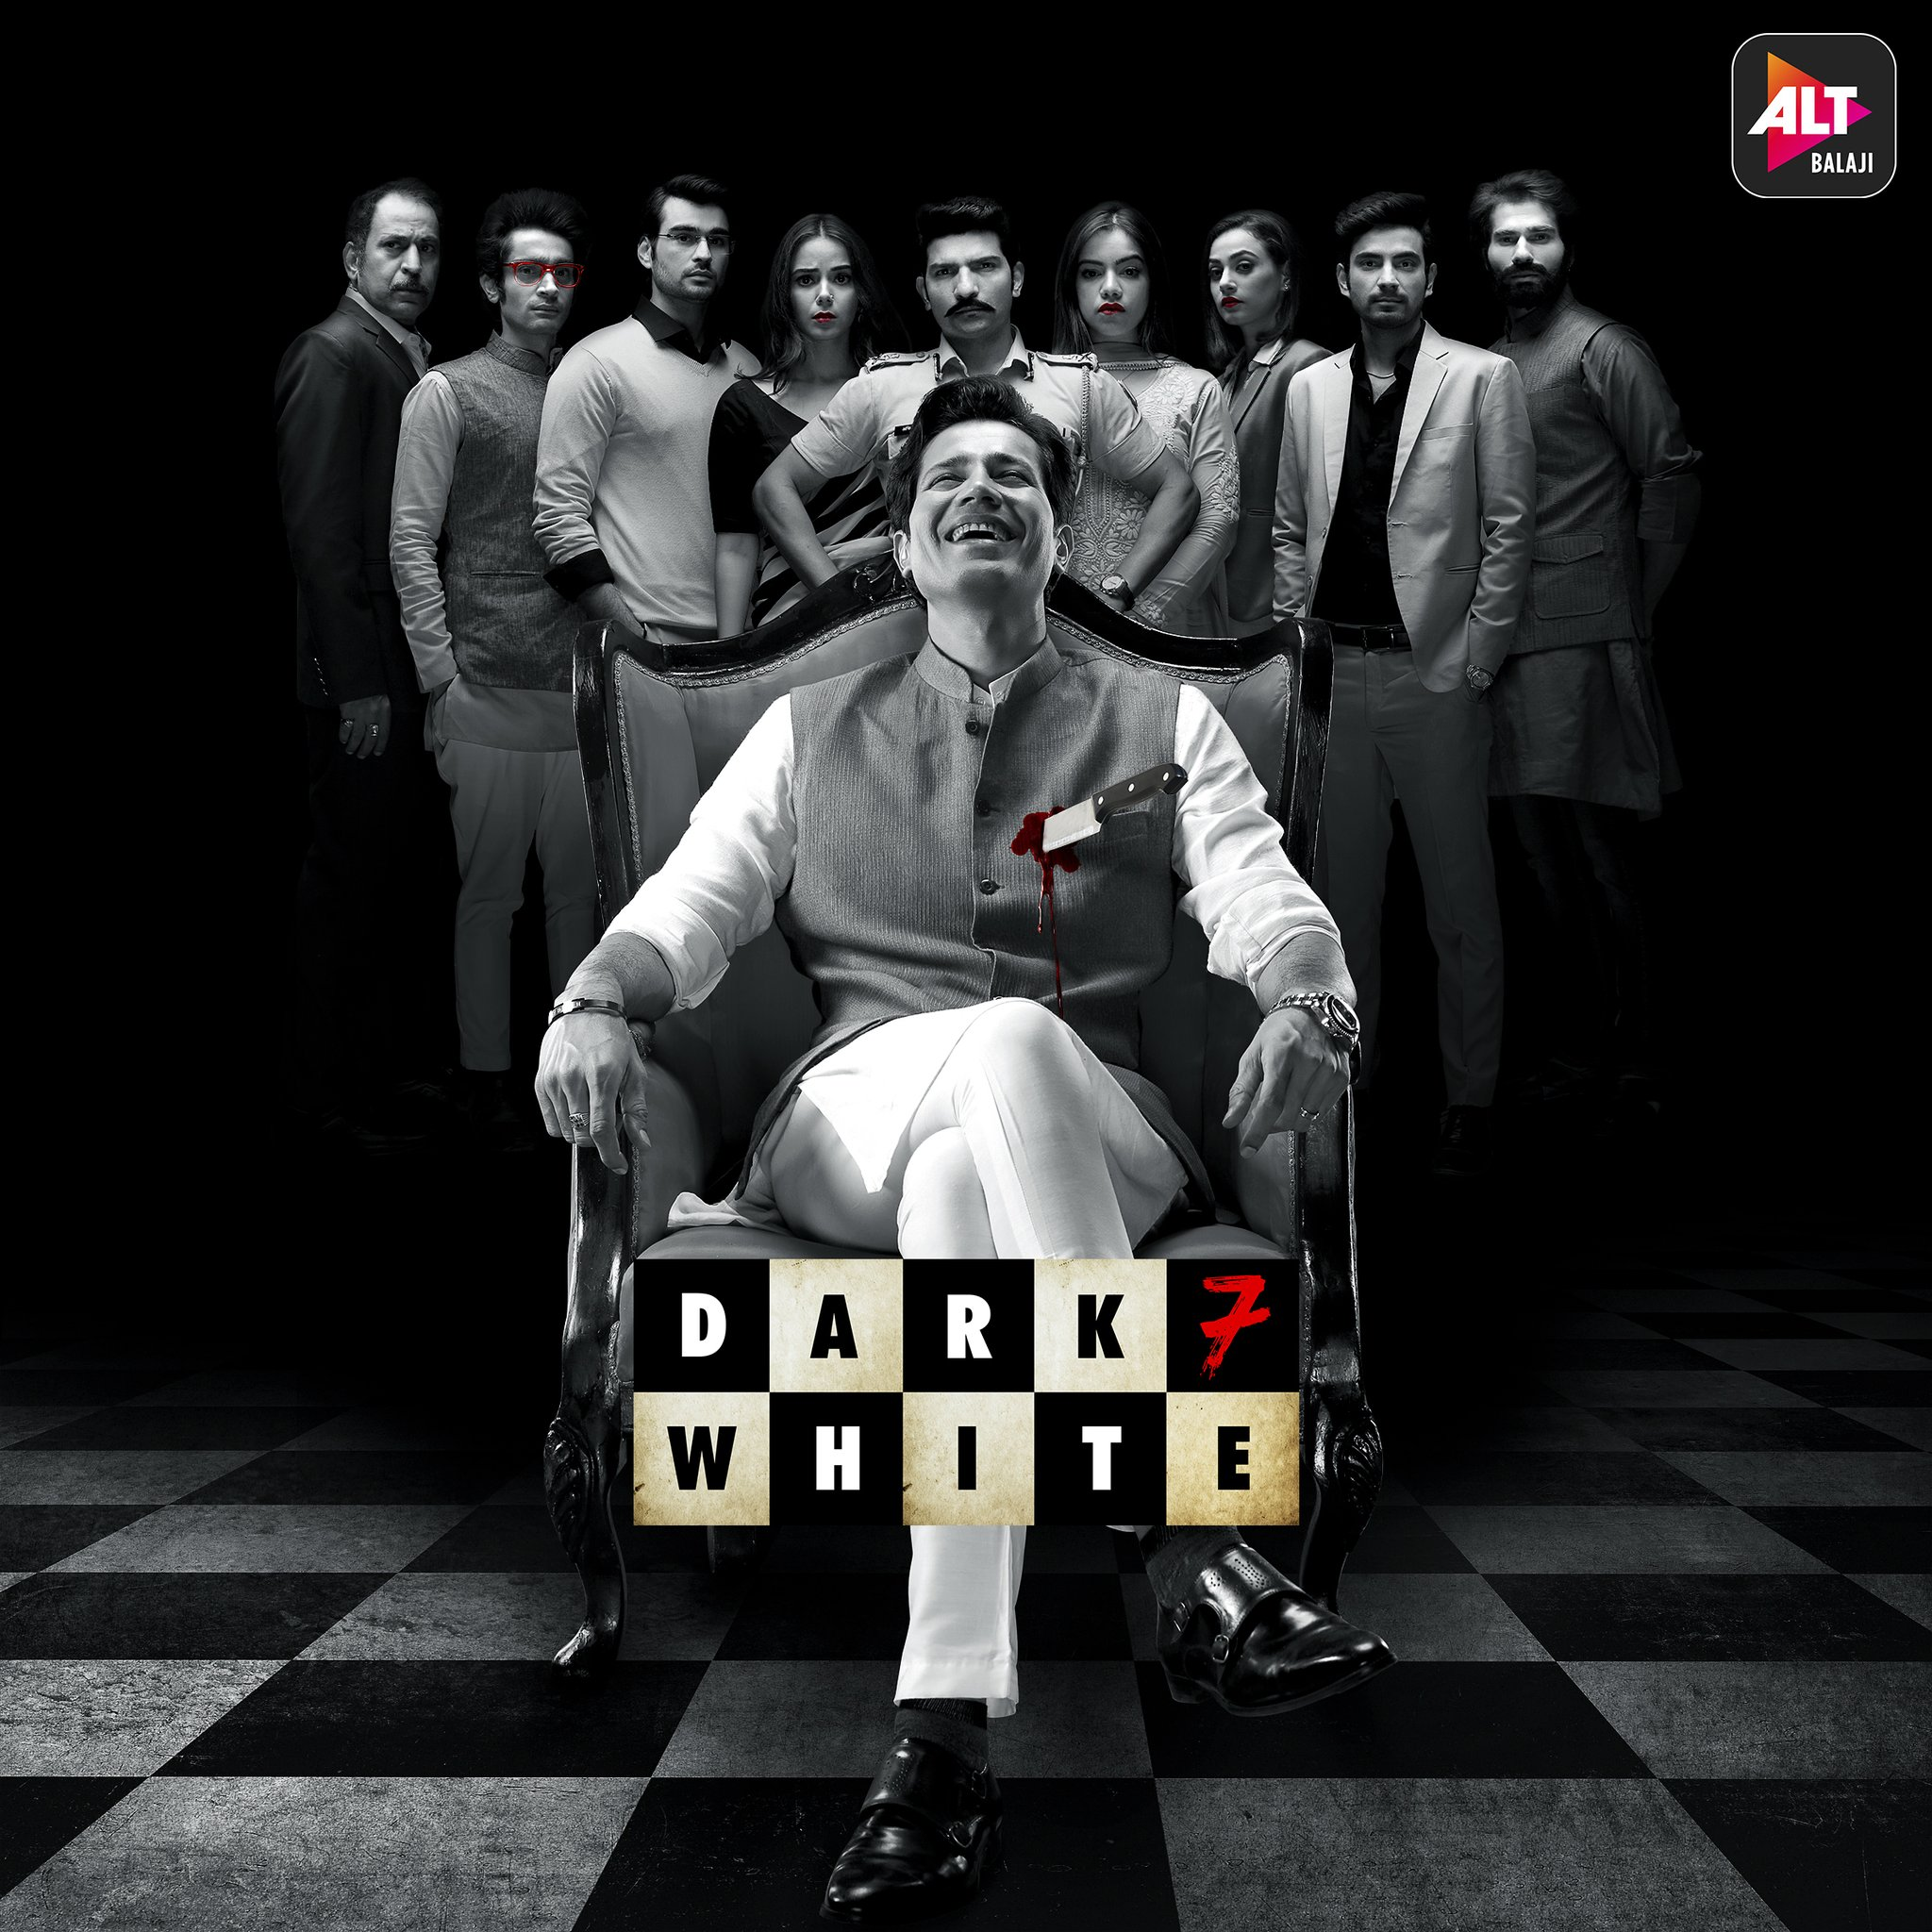 Dark 7 White (2020) S01 Hindi Complete Web Series 720p HDRip 1.5GB Dwonload